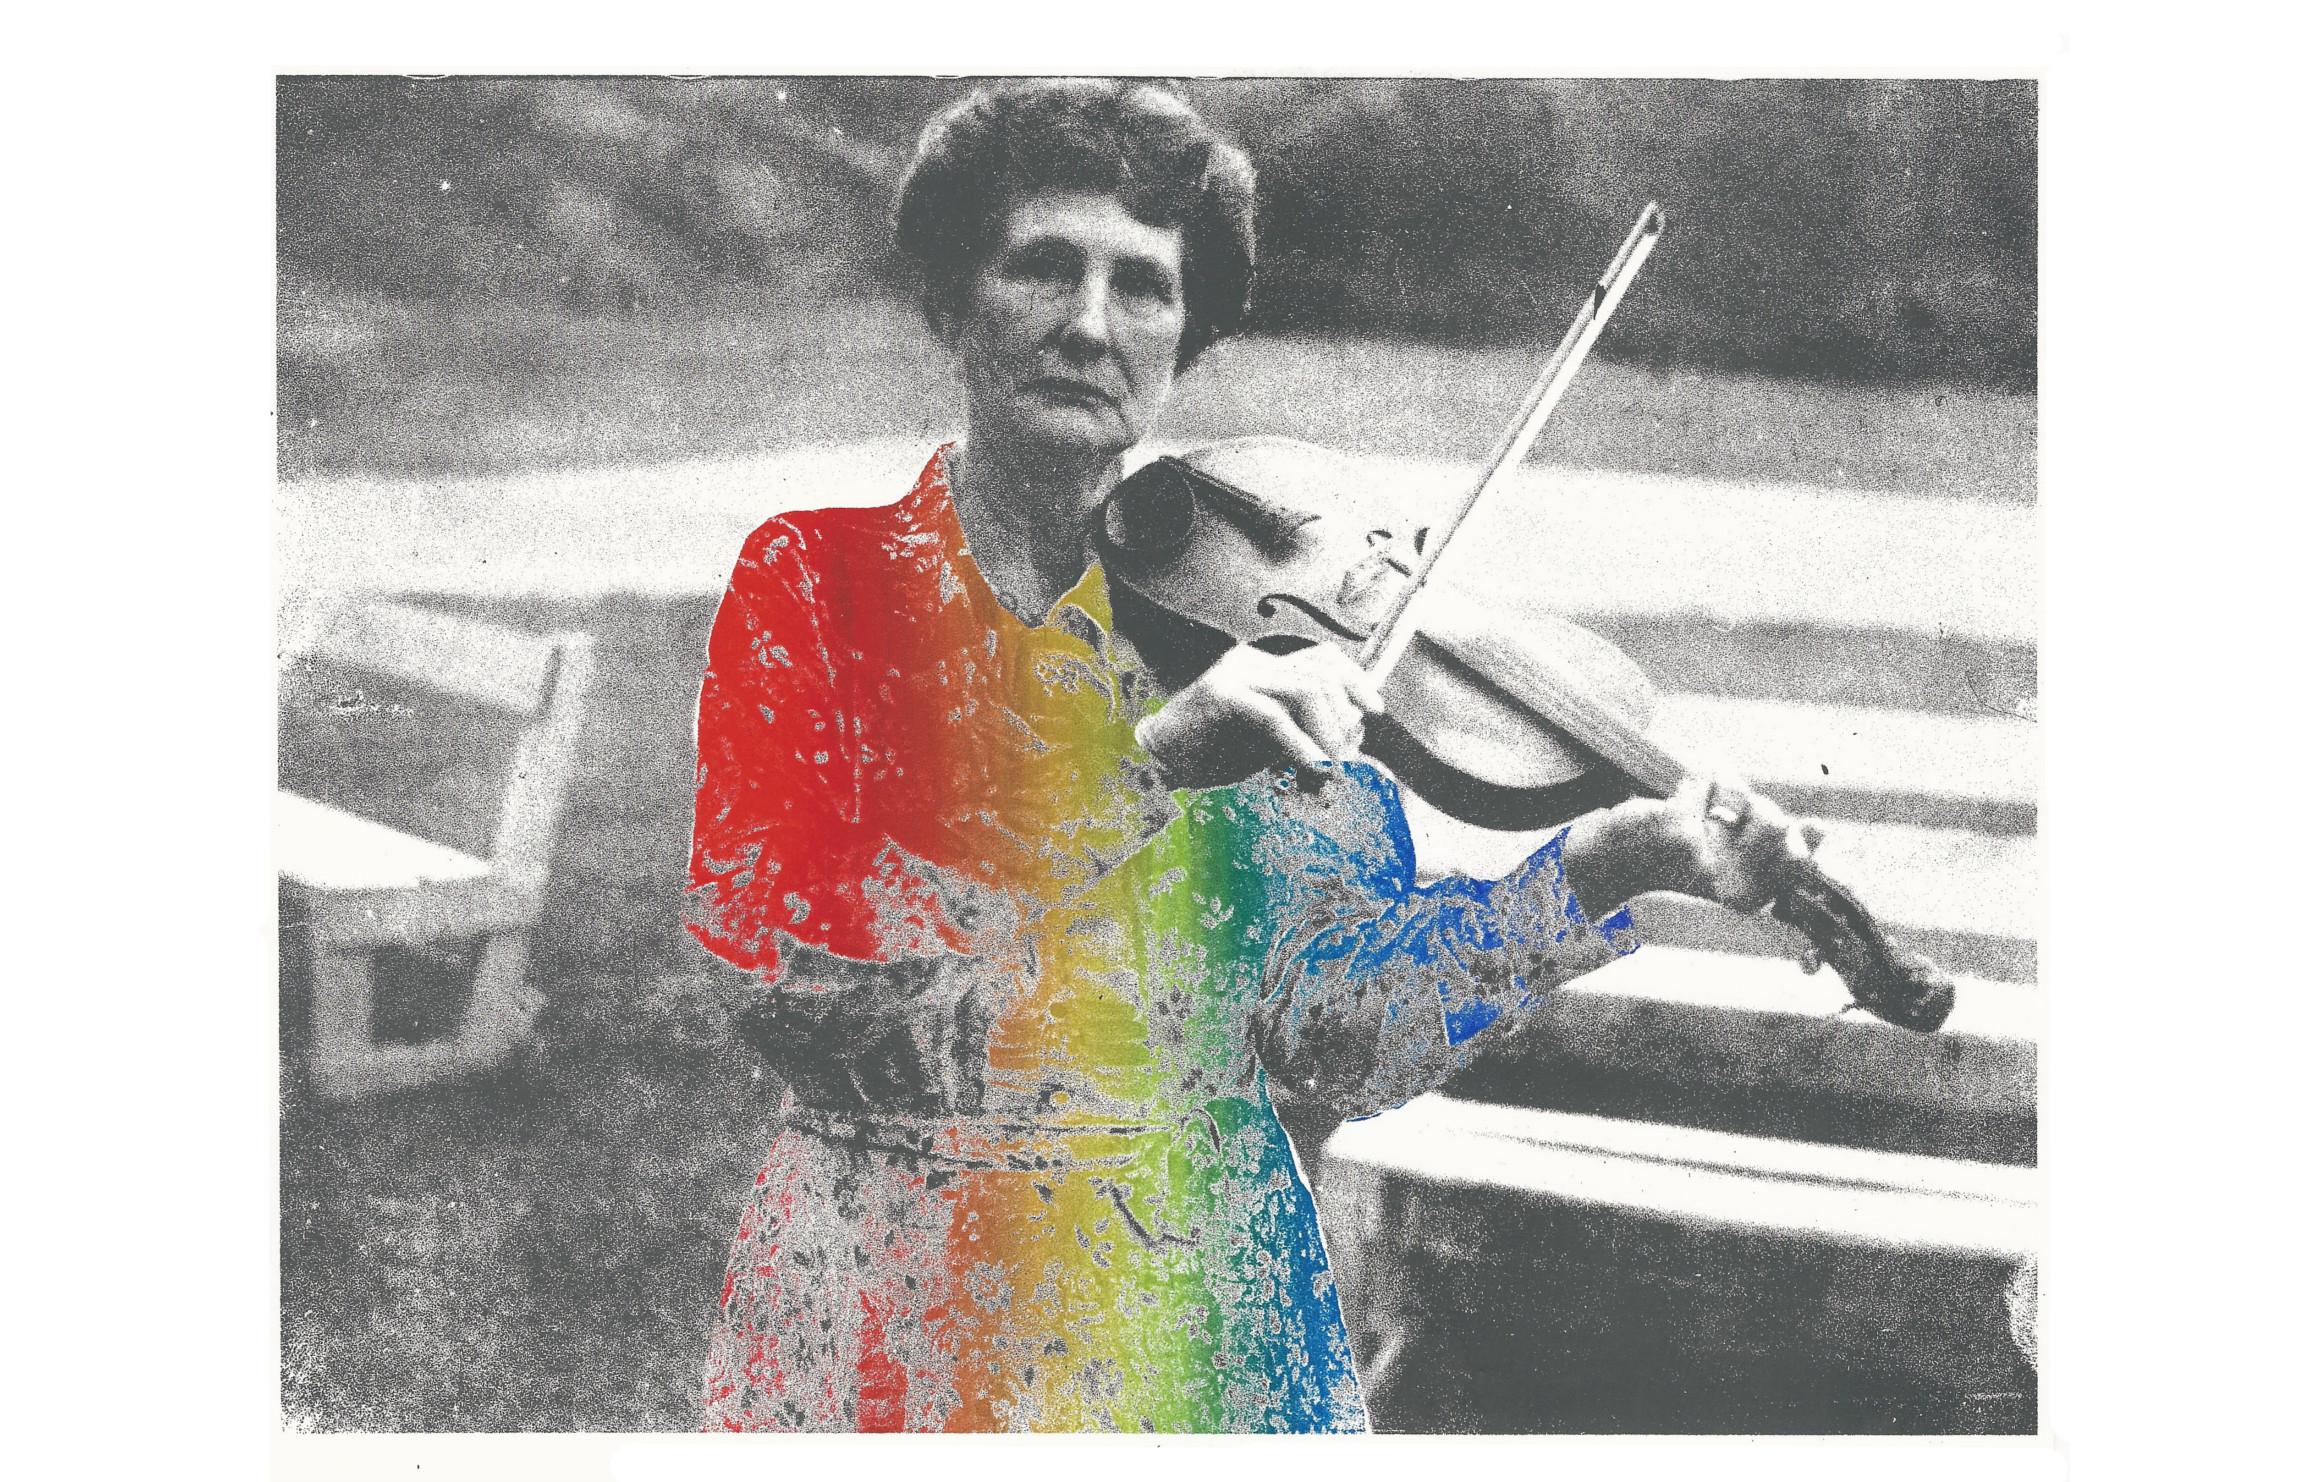 Shout & Shine: A Celebration of Diversity in Bluegrass